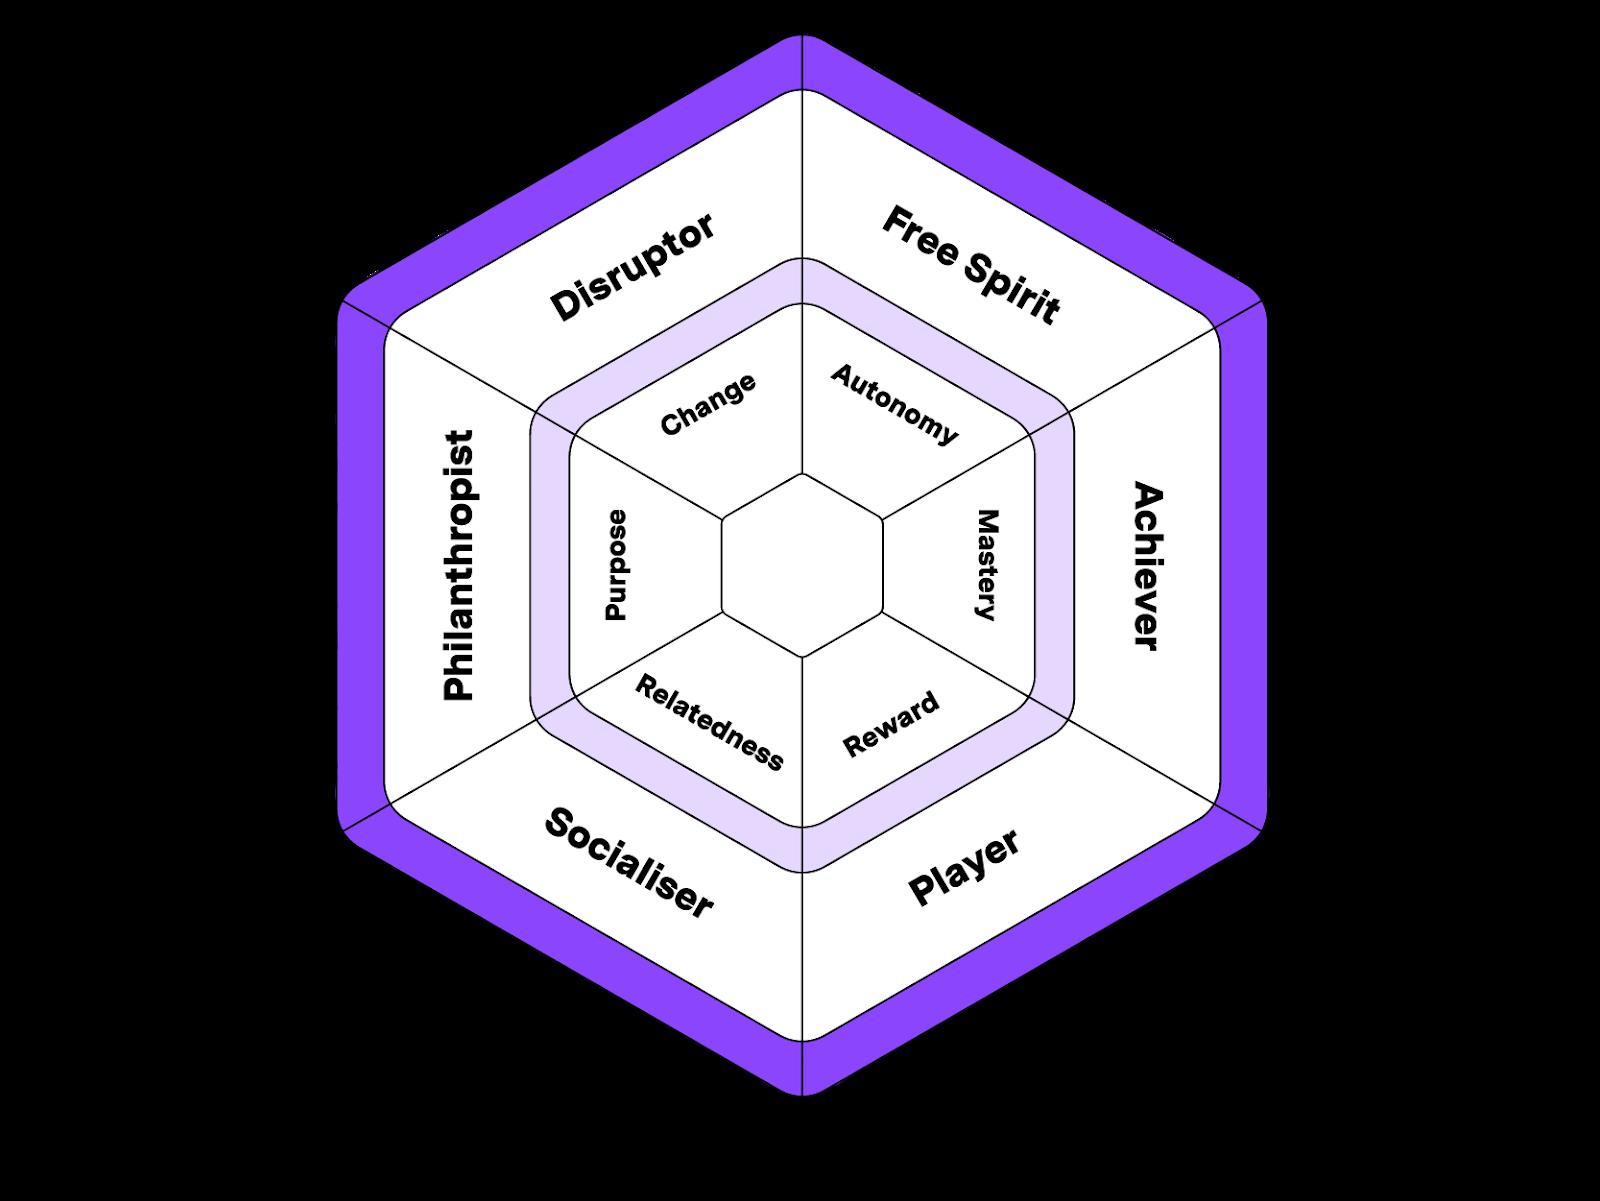 Gamification Hexad Scale